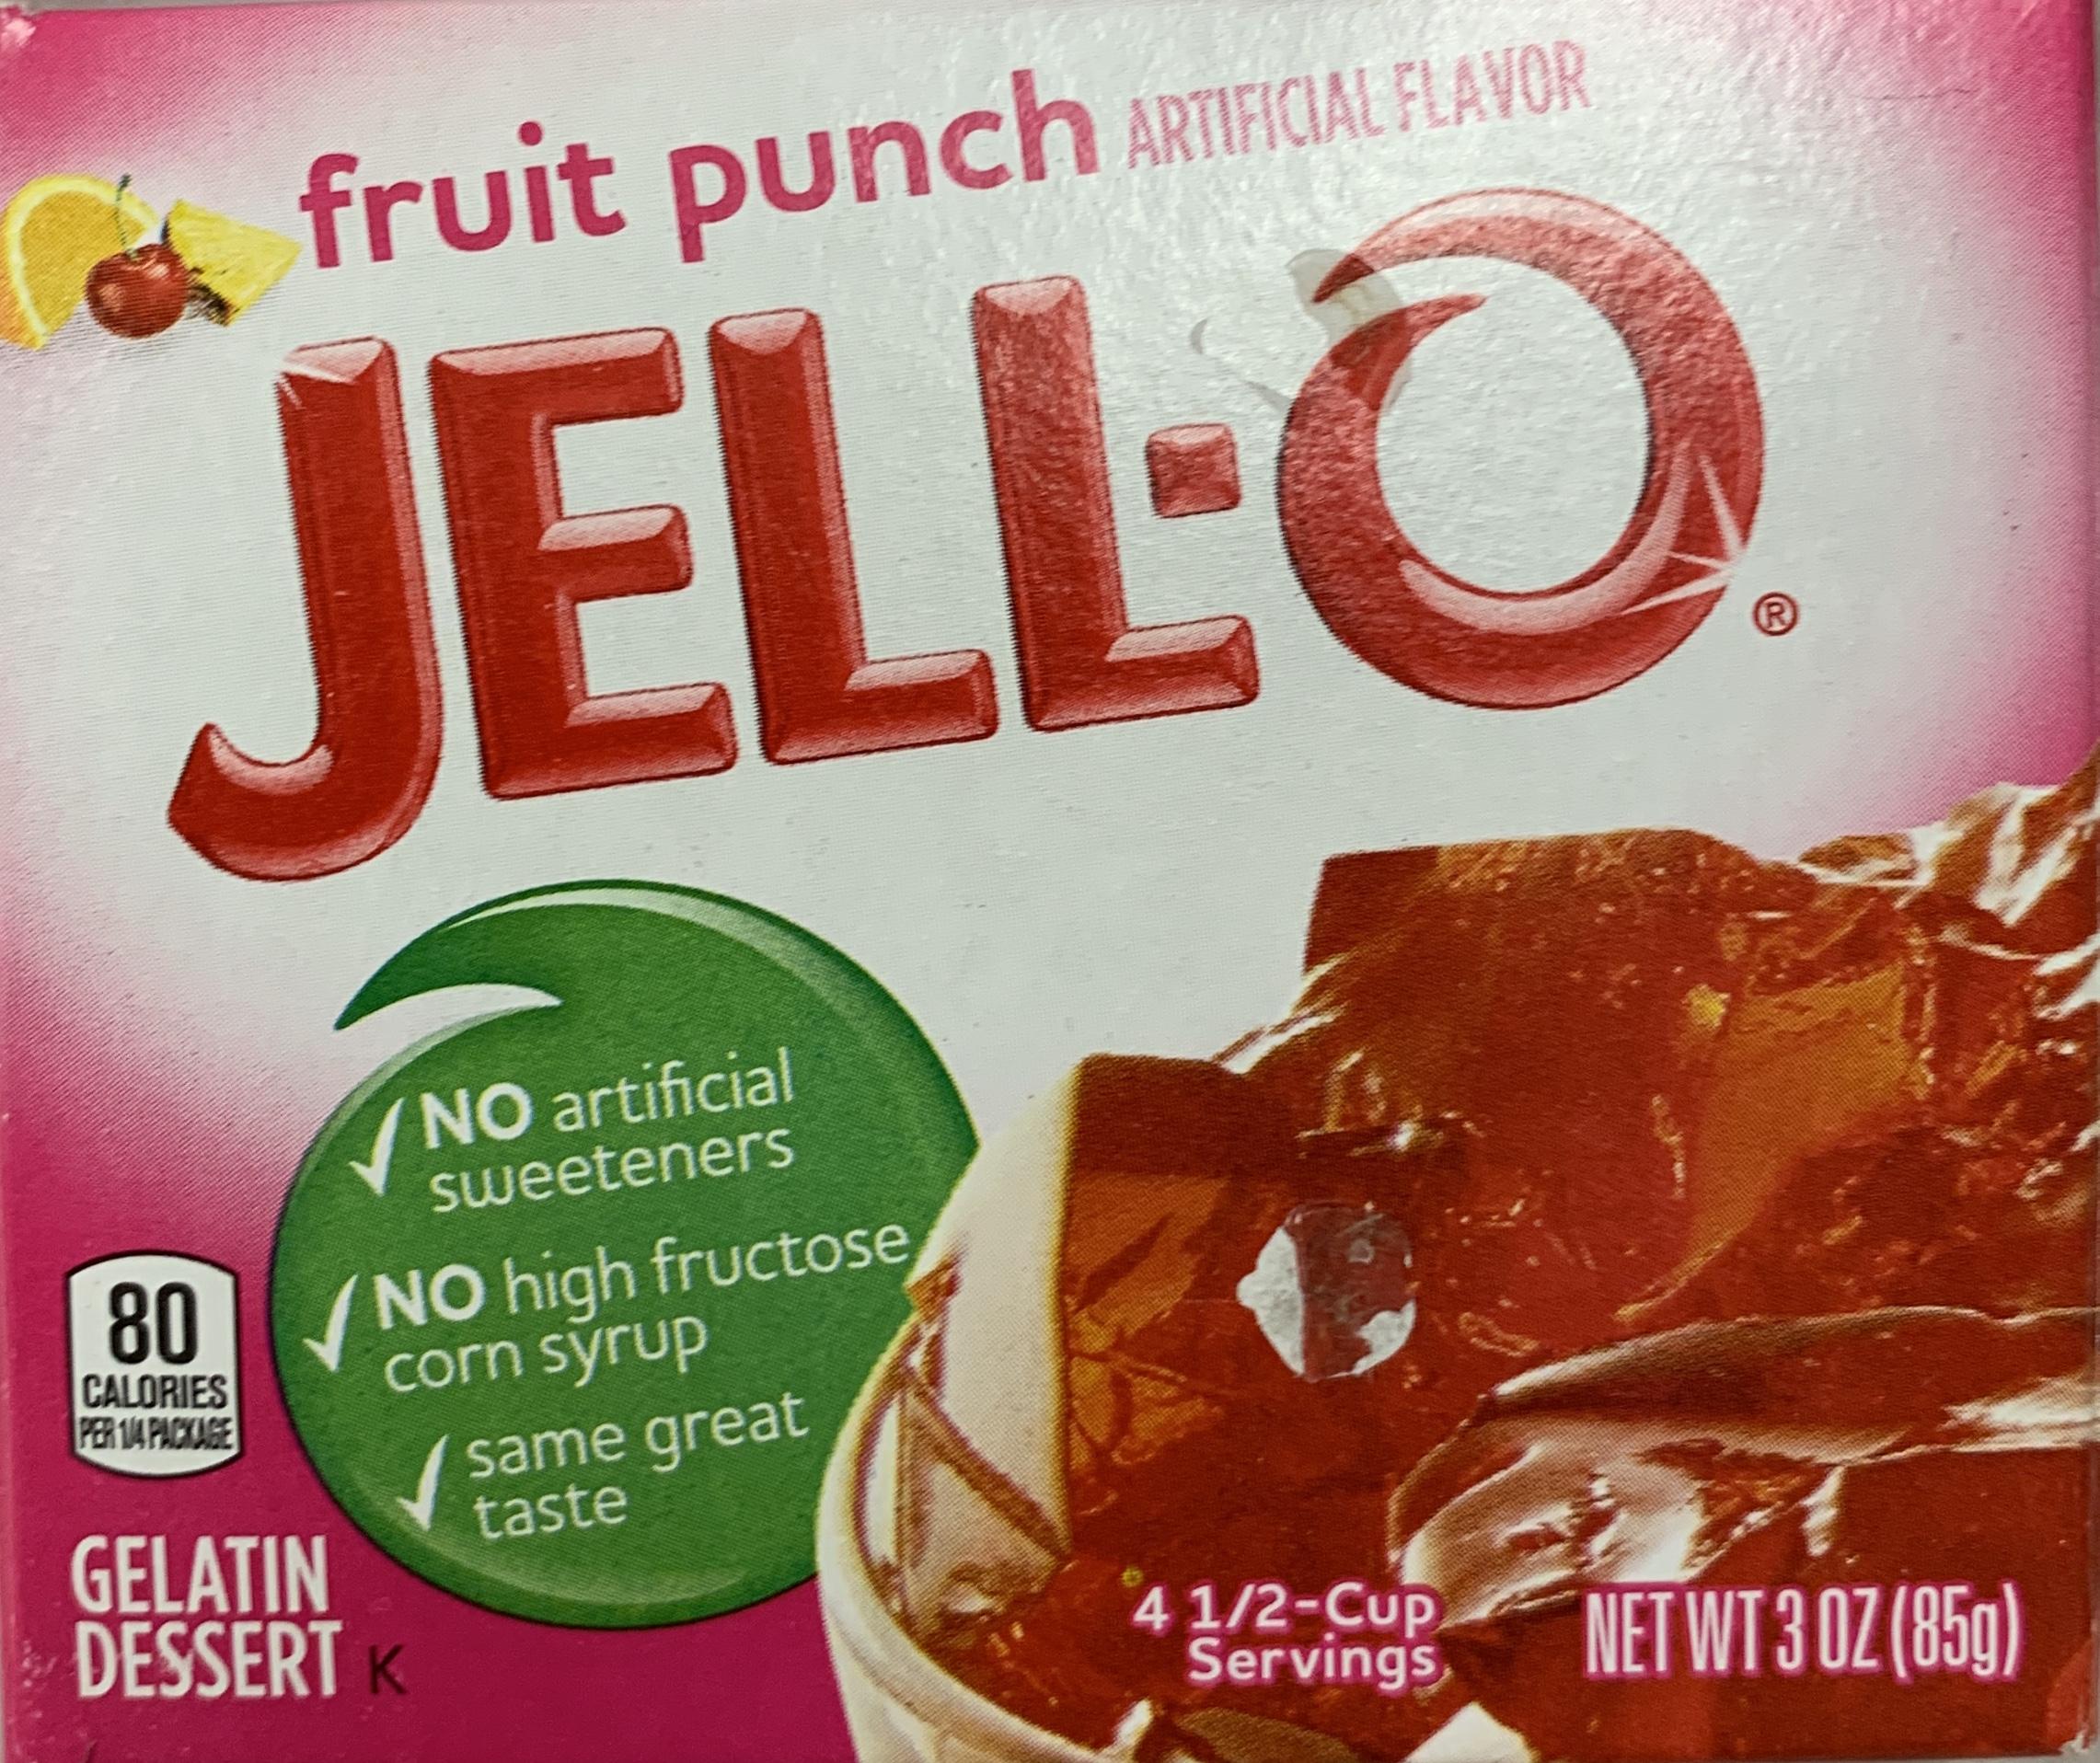 Jell-O Fruit Punch